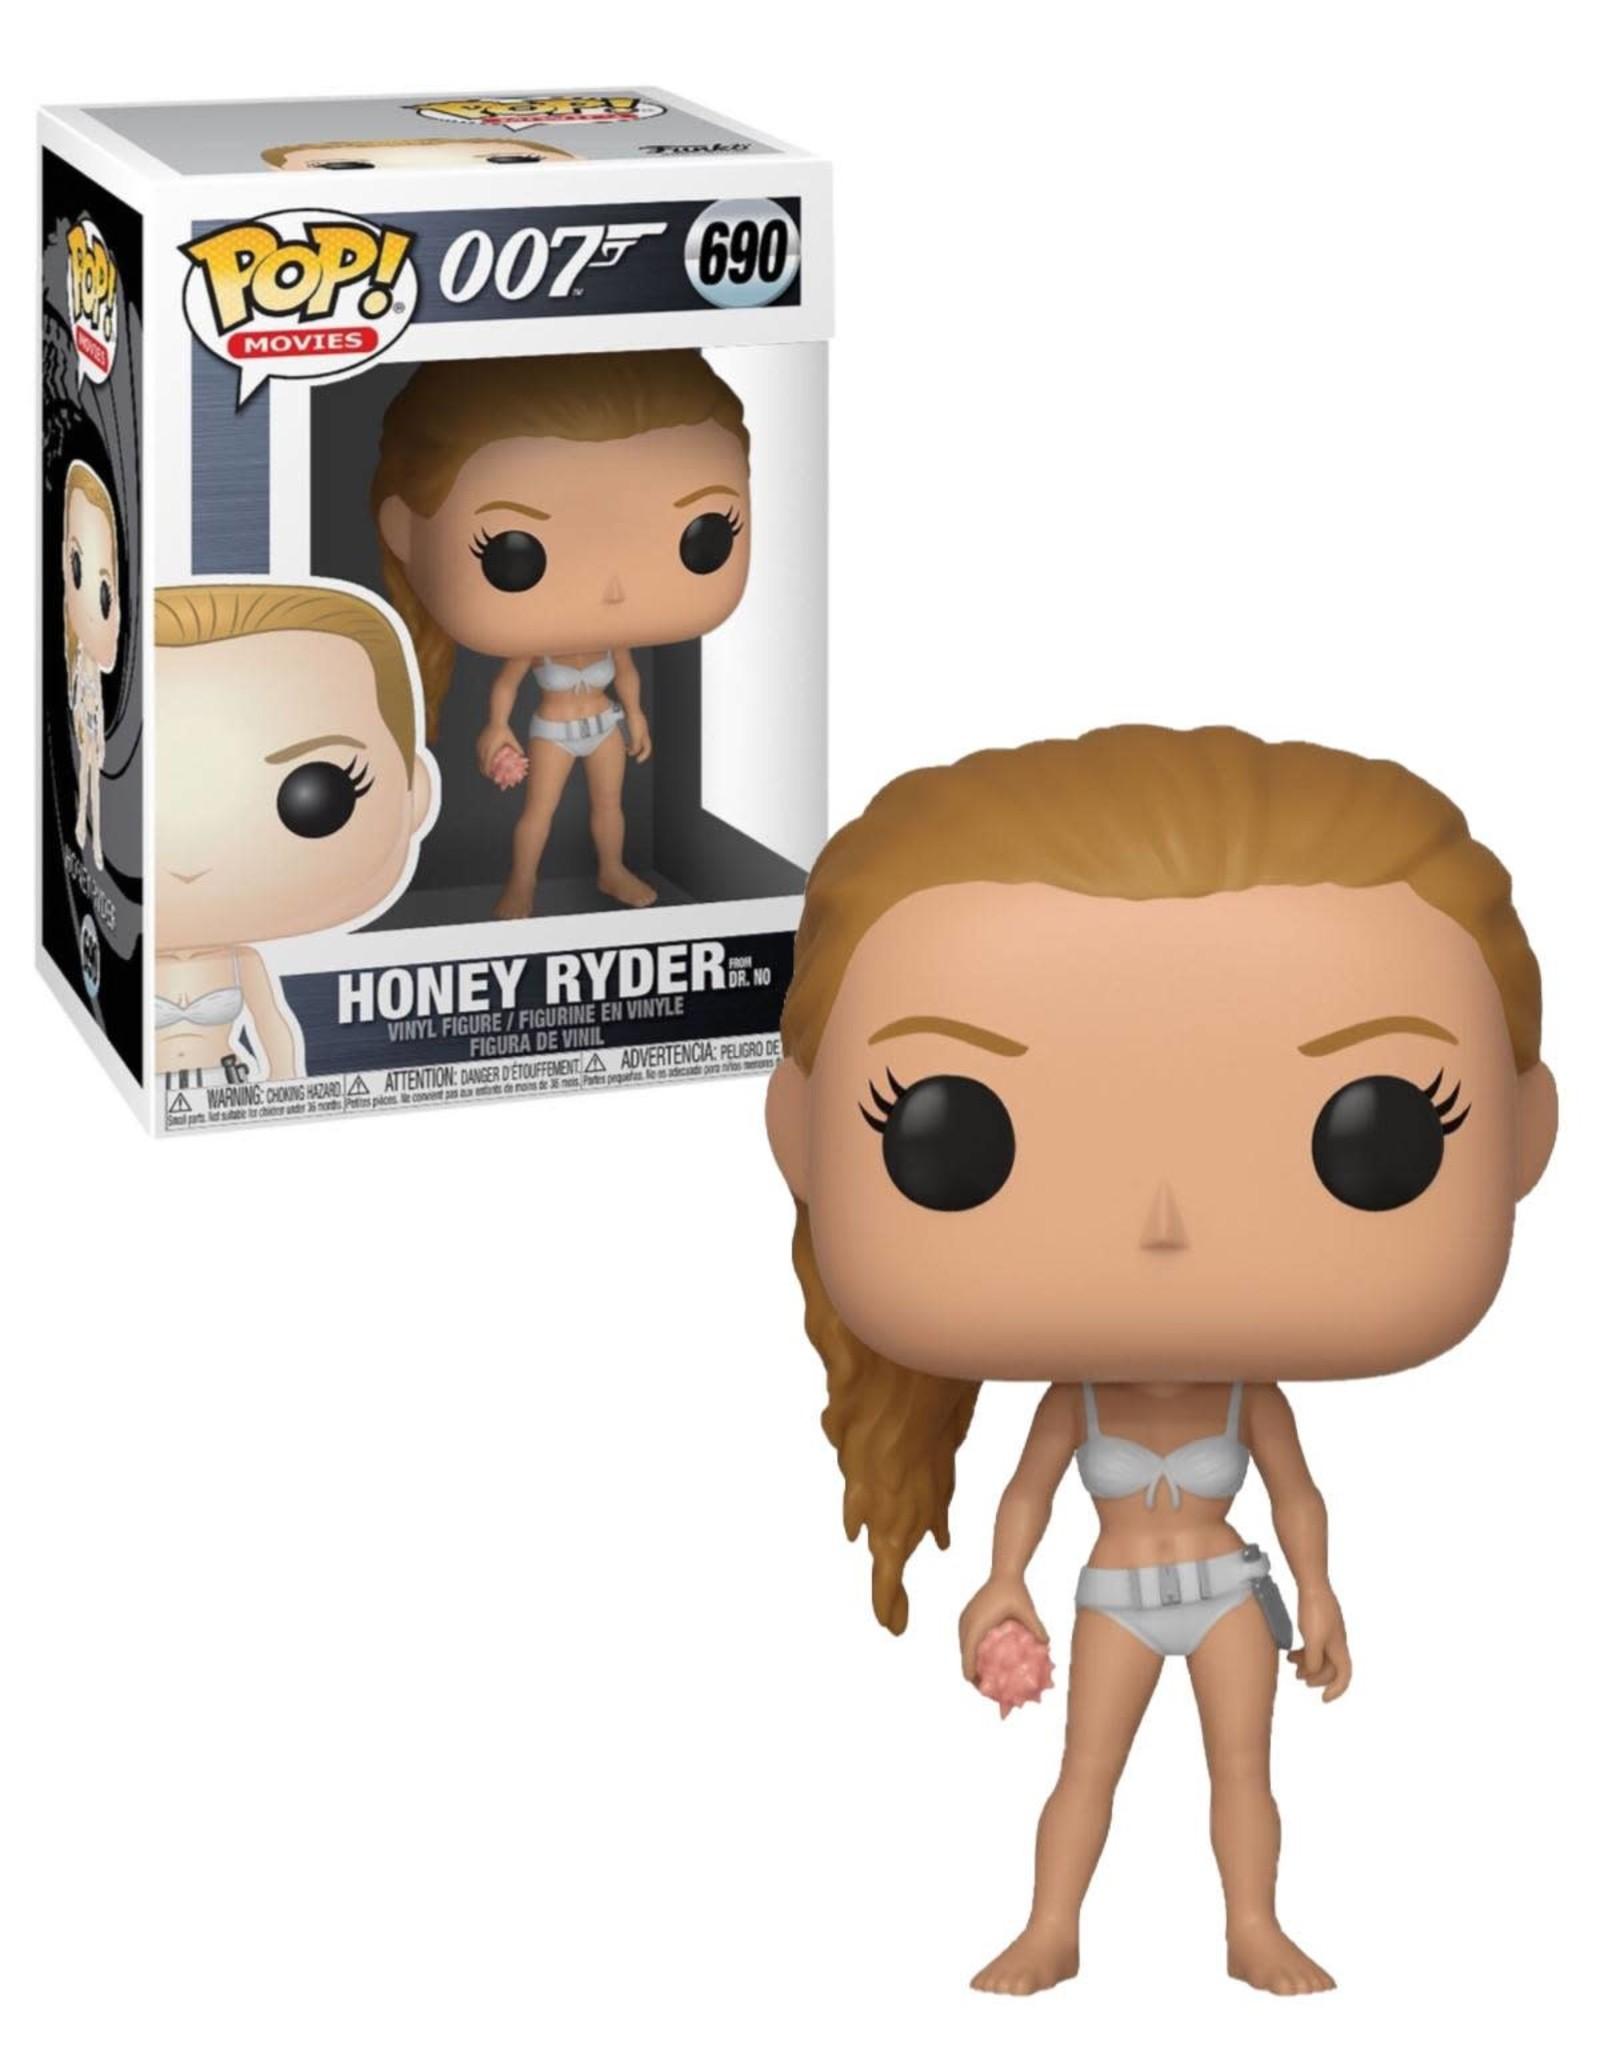 007 690 ( Funko Pop ) Honey Ryder